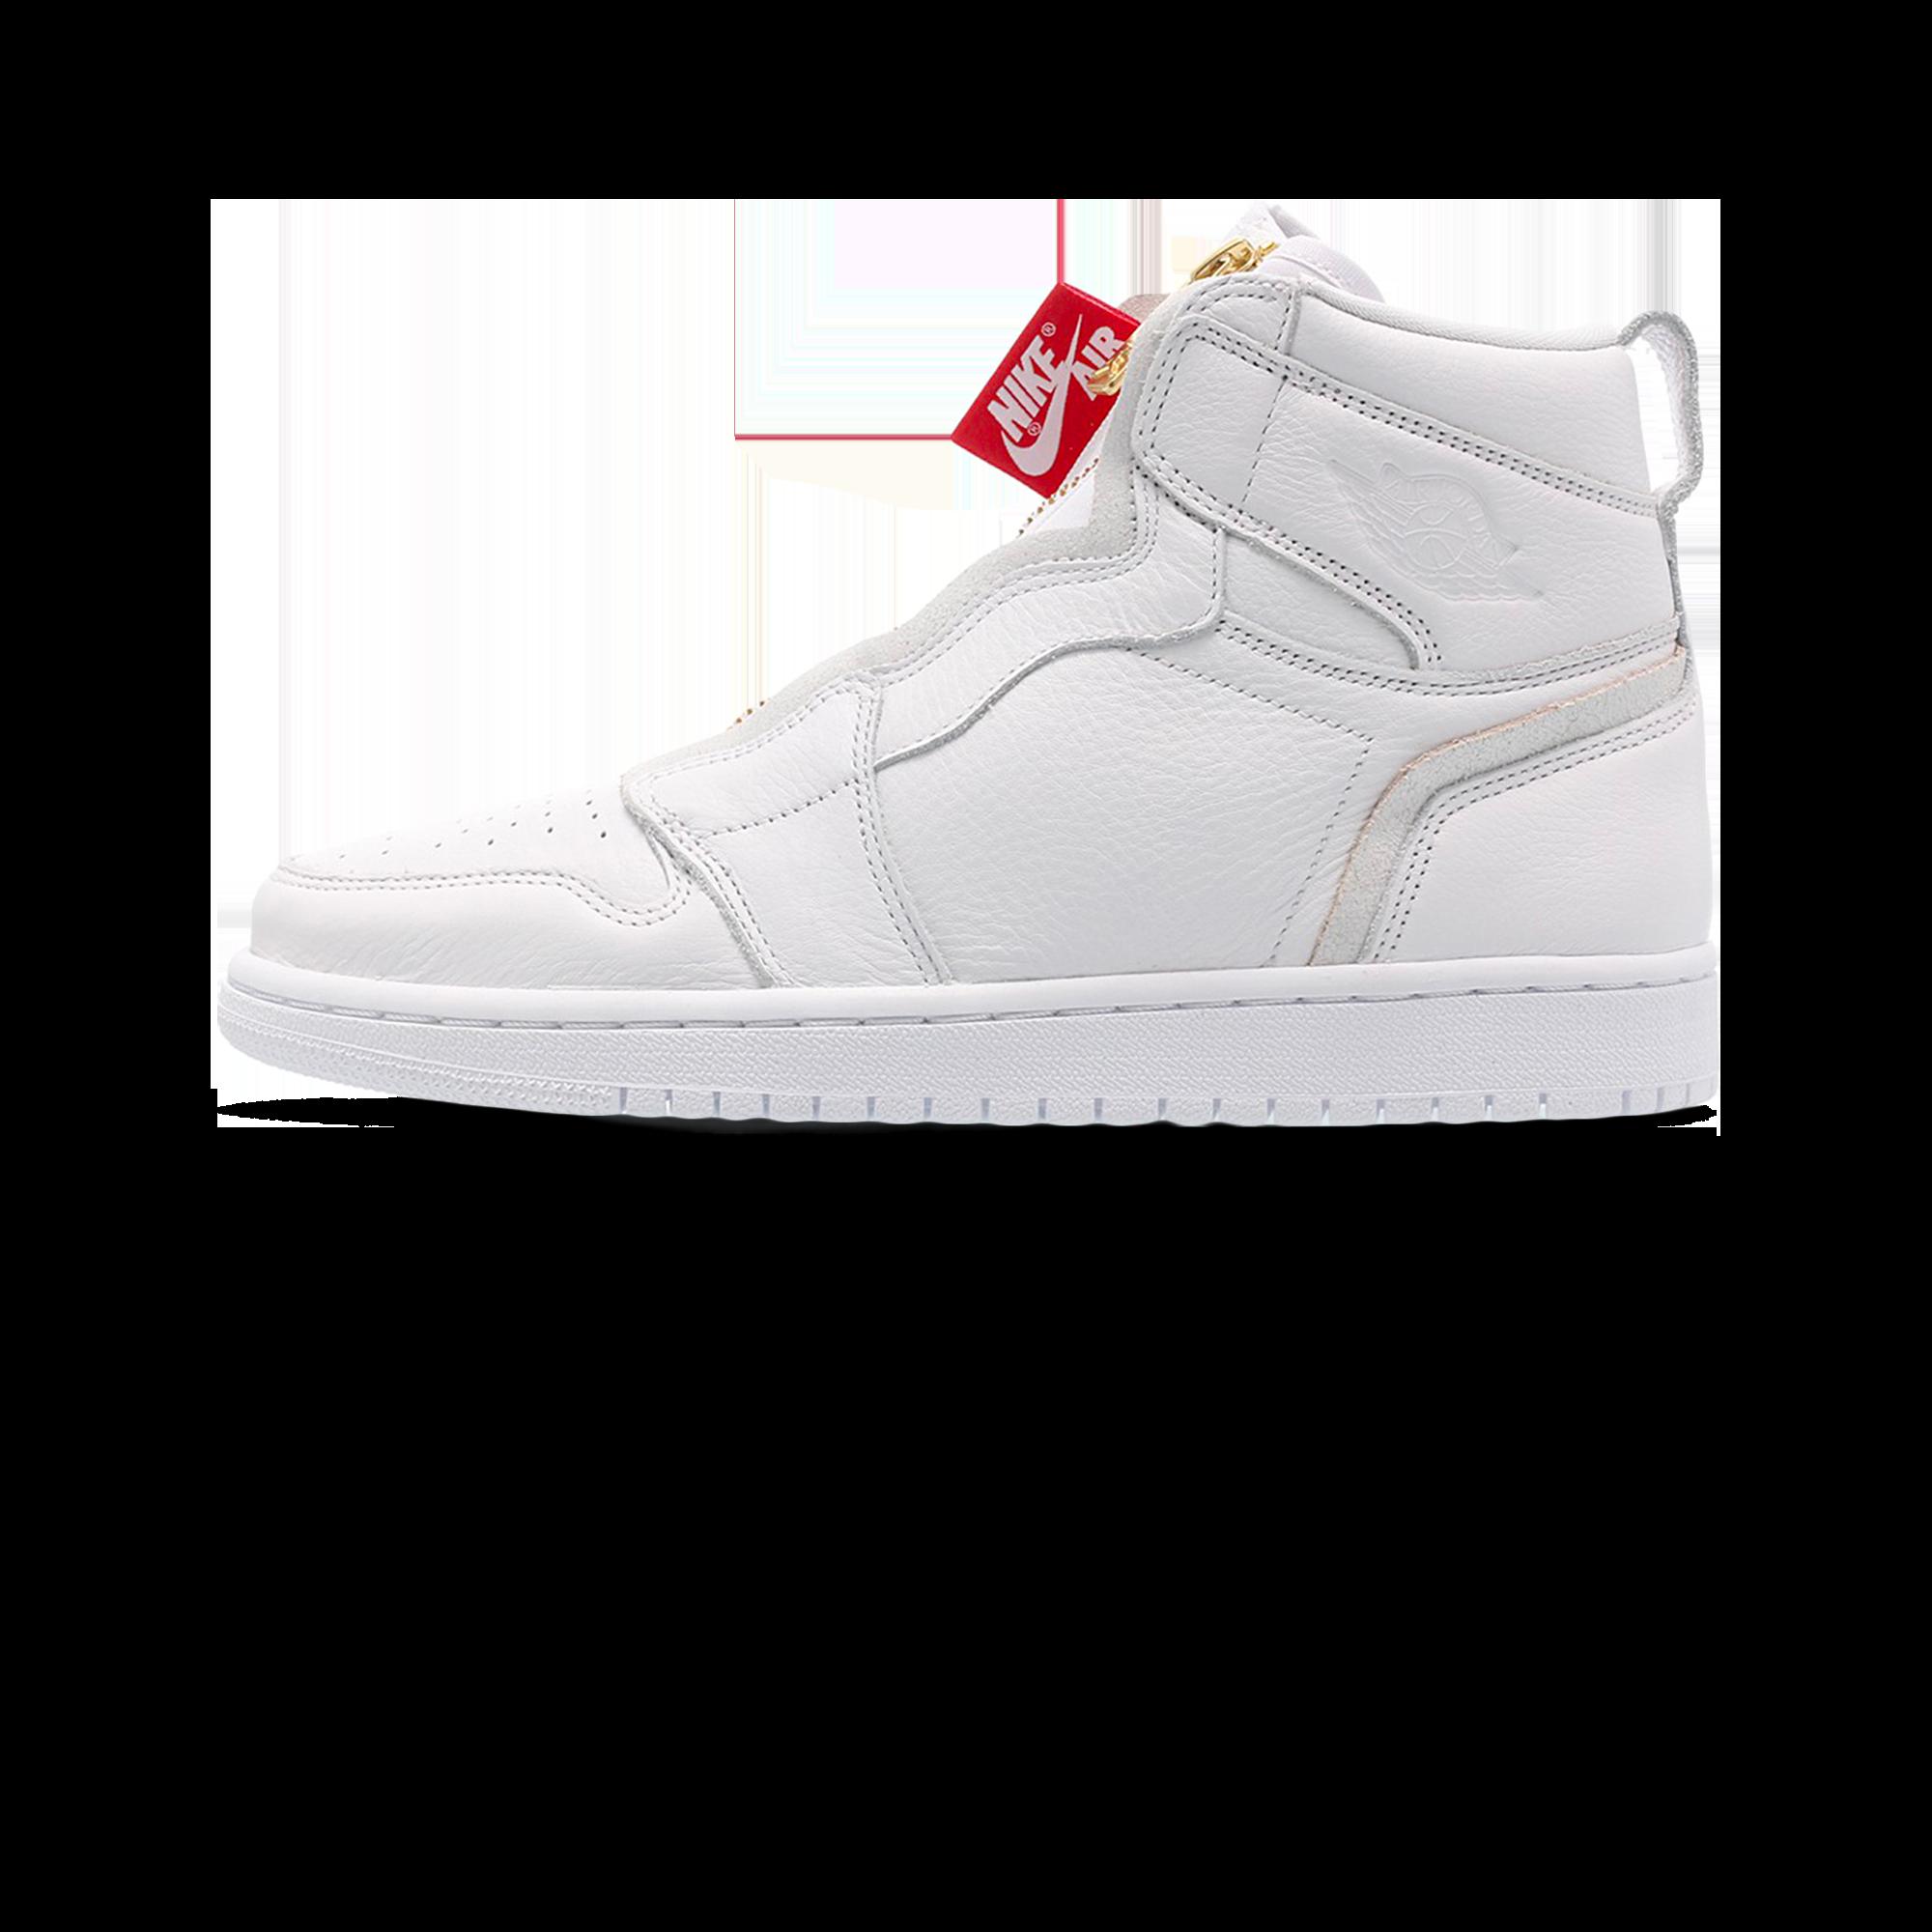 best loved 28a49 66241 Air Jordan Jordan 1 High Zip W white / university red - Woman |  Holypopstore.com